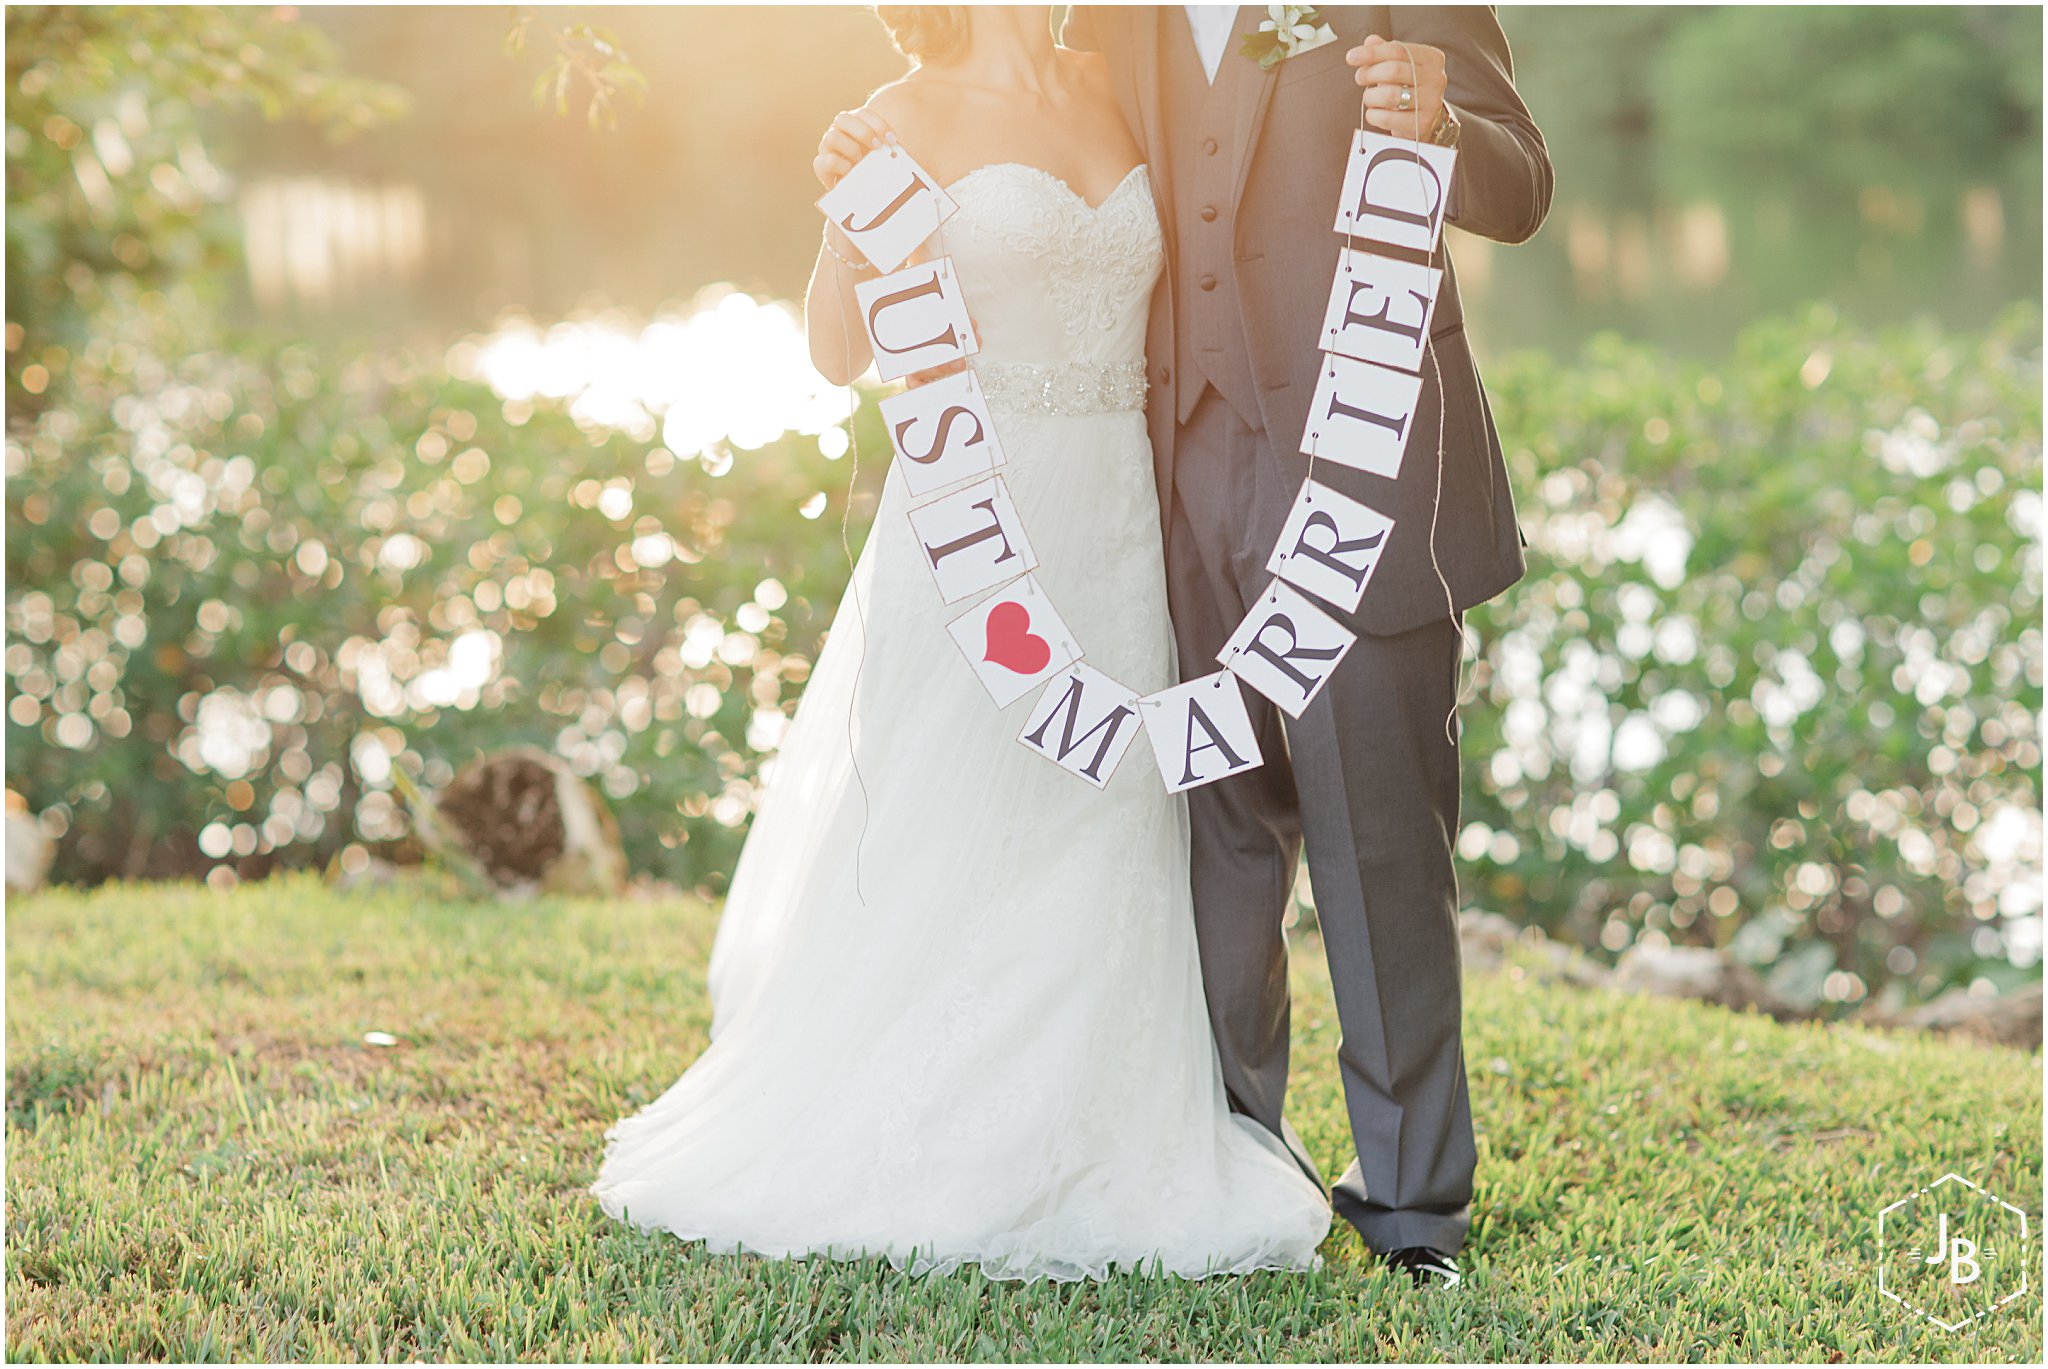 WeddingandEngagementFloridaPhotographer_0367.jpg